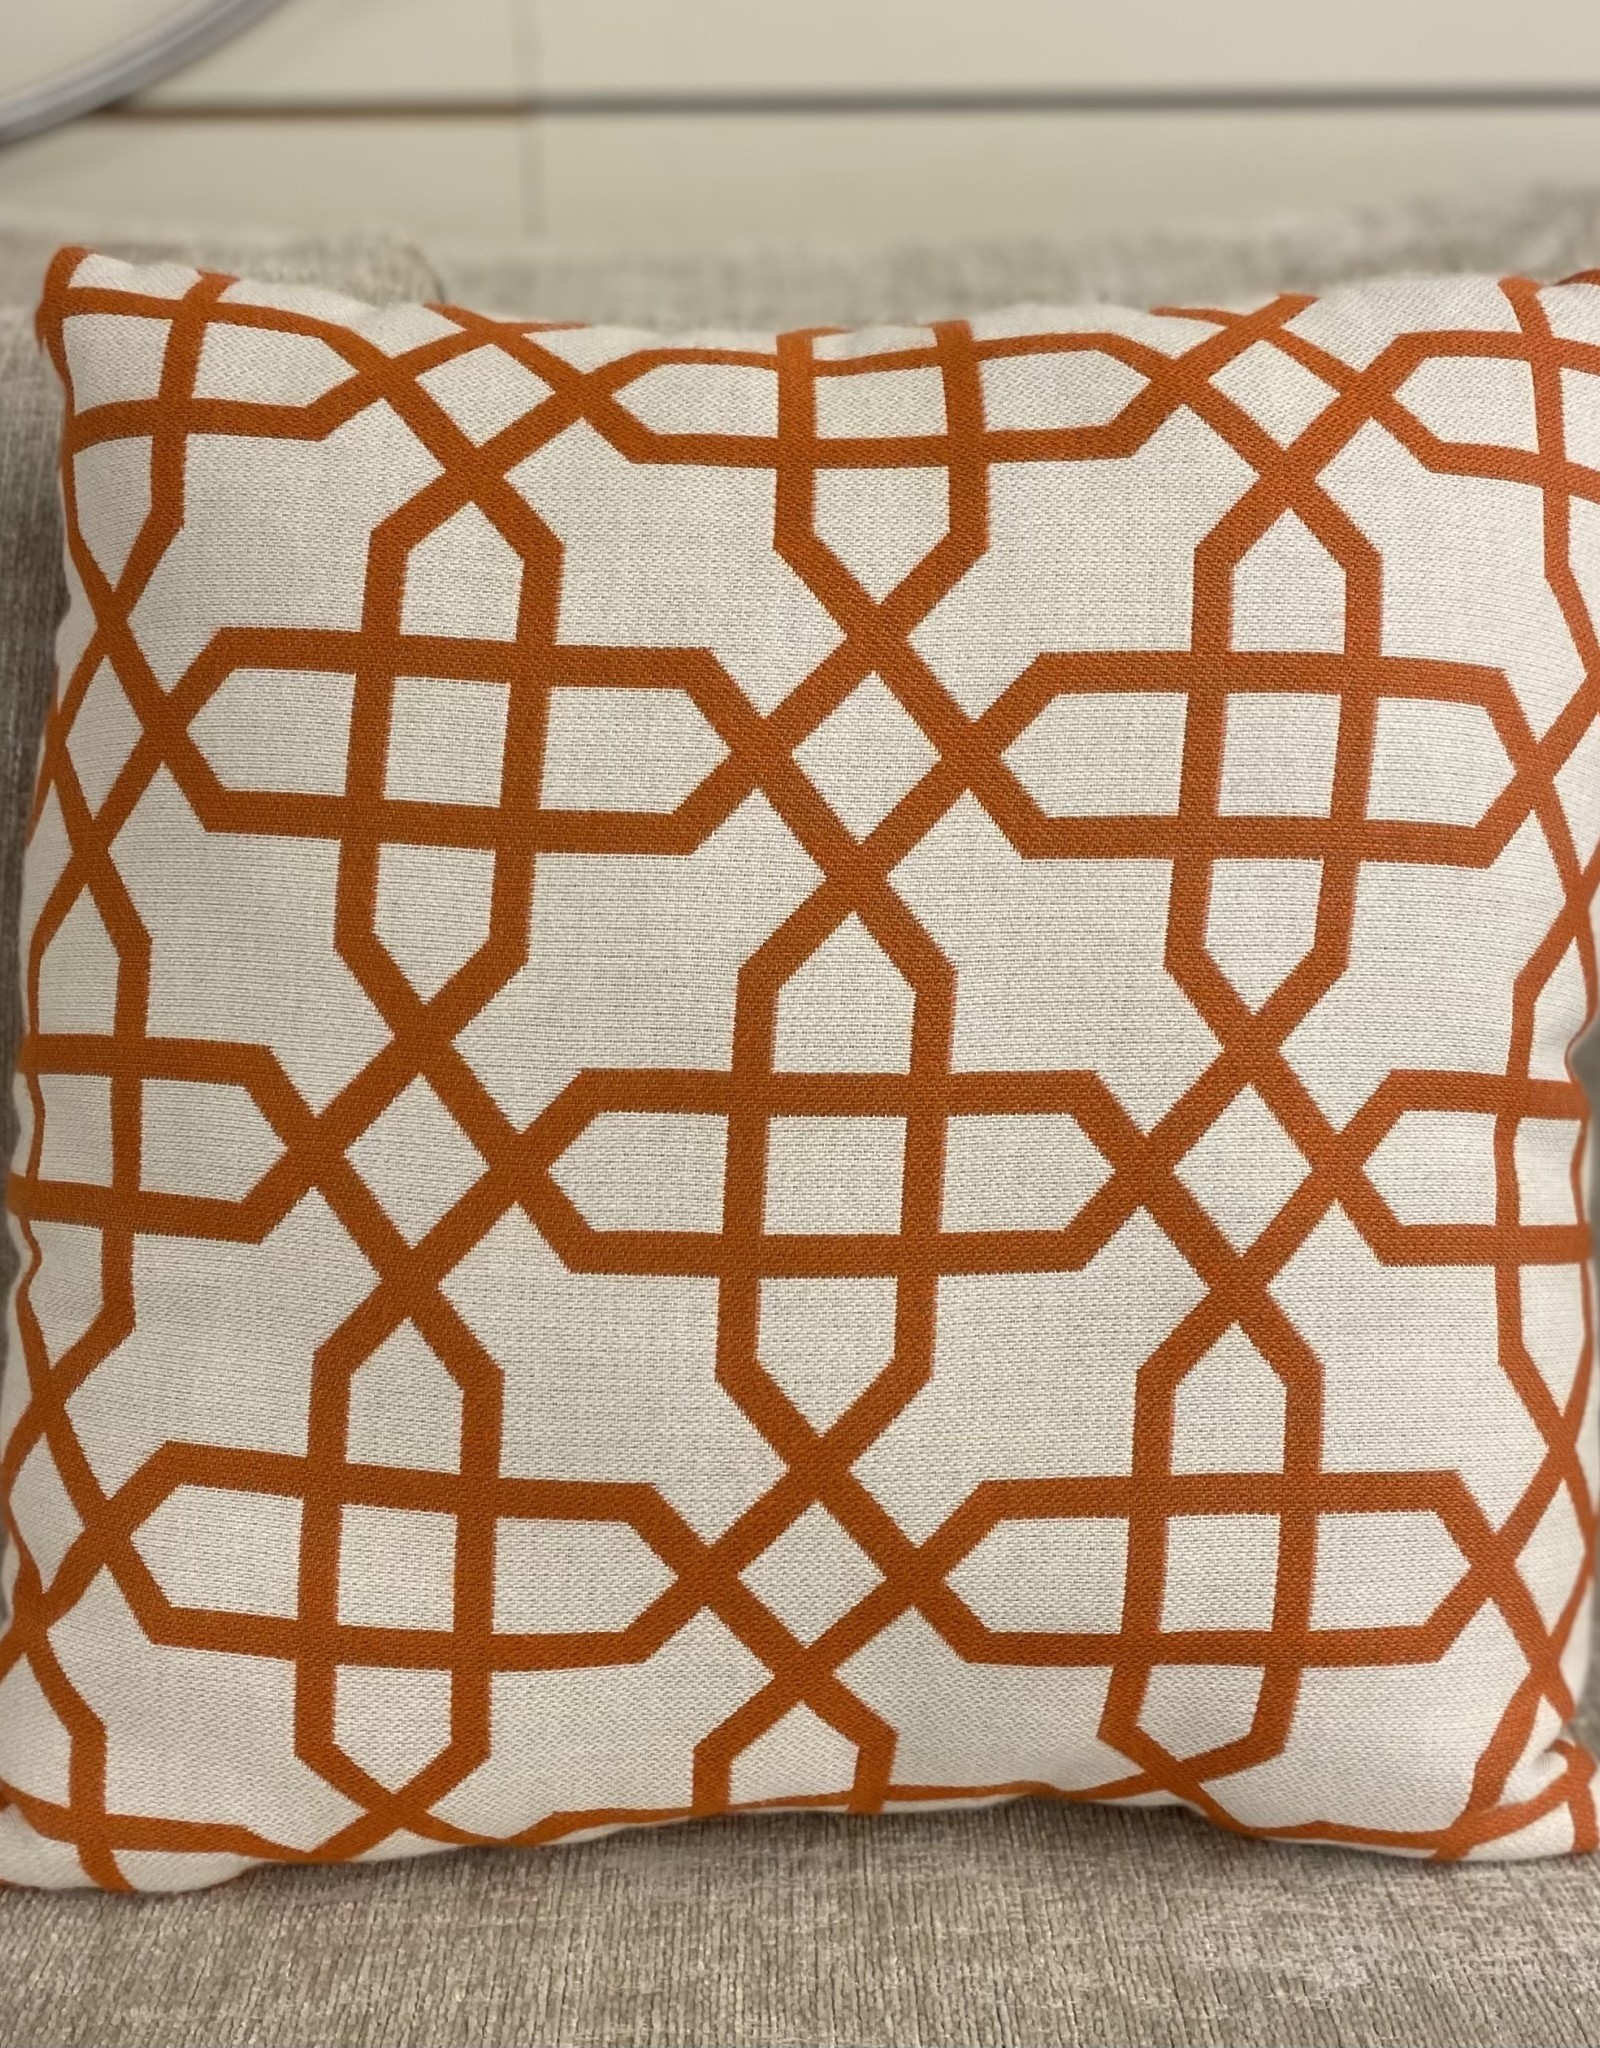 Ratana Cushions Ratana 16 inch Toss FO7074 Bevel Mandarin